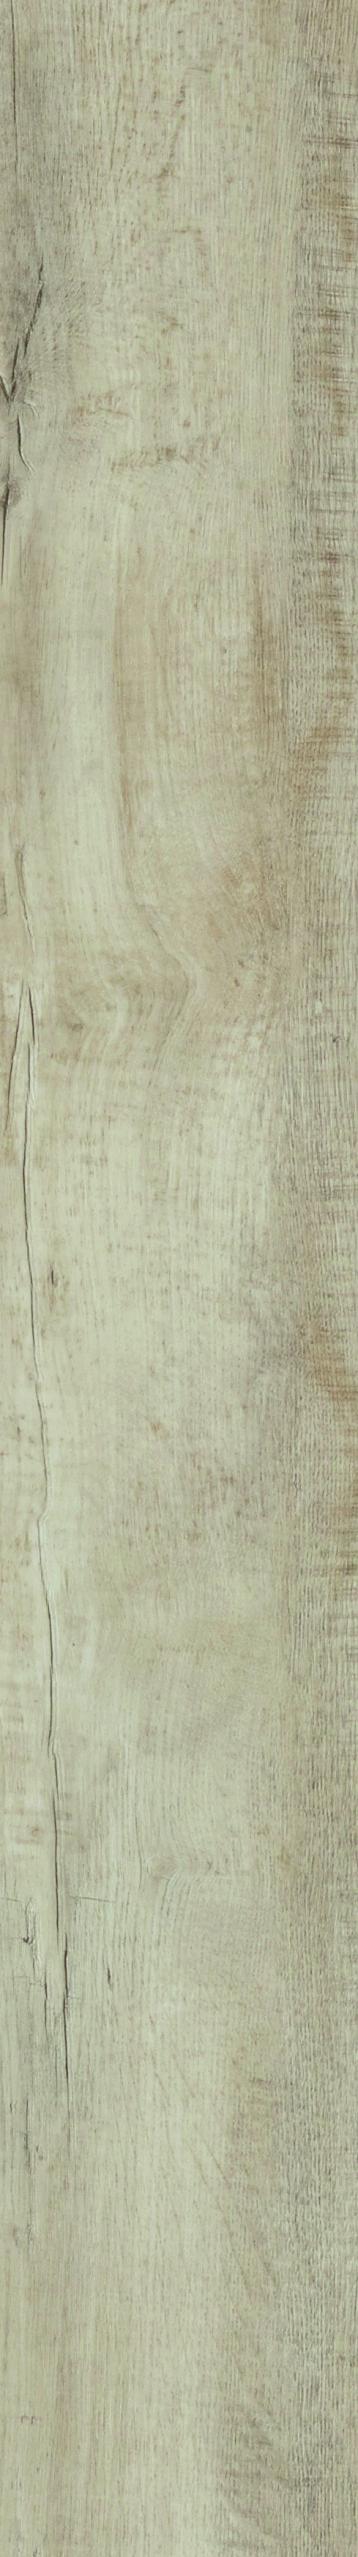 Līmejamā vinila grīda Moduleo Impress Country Oak